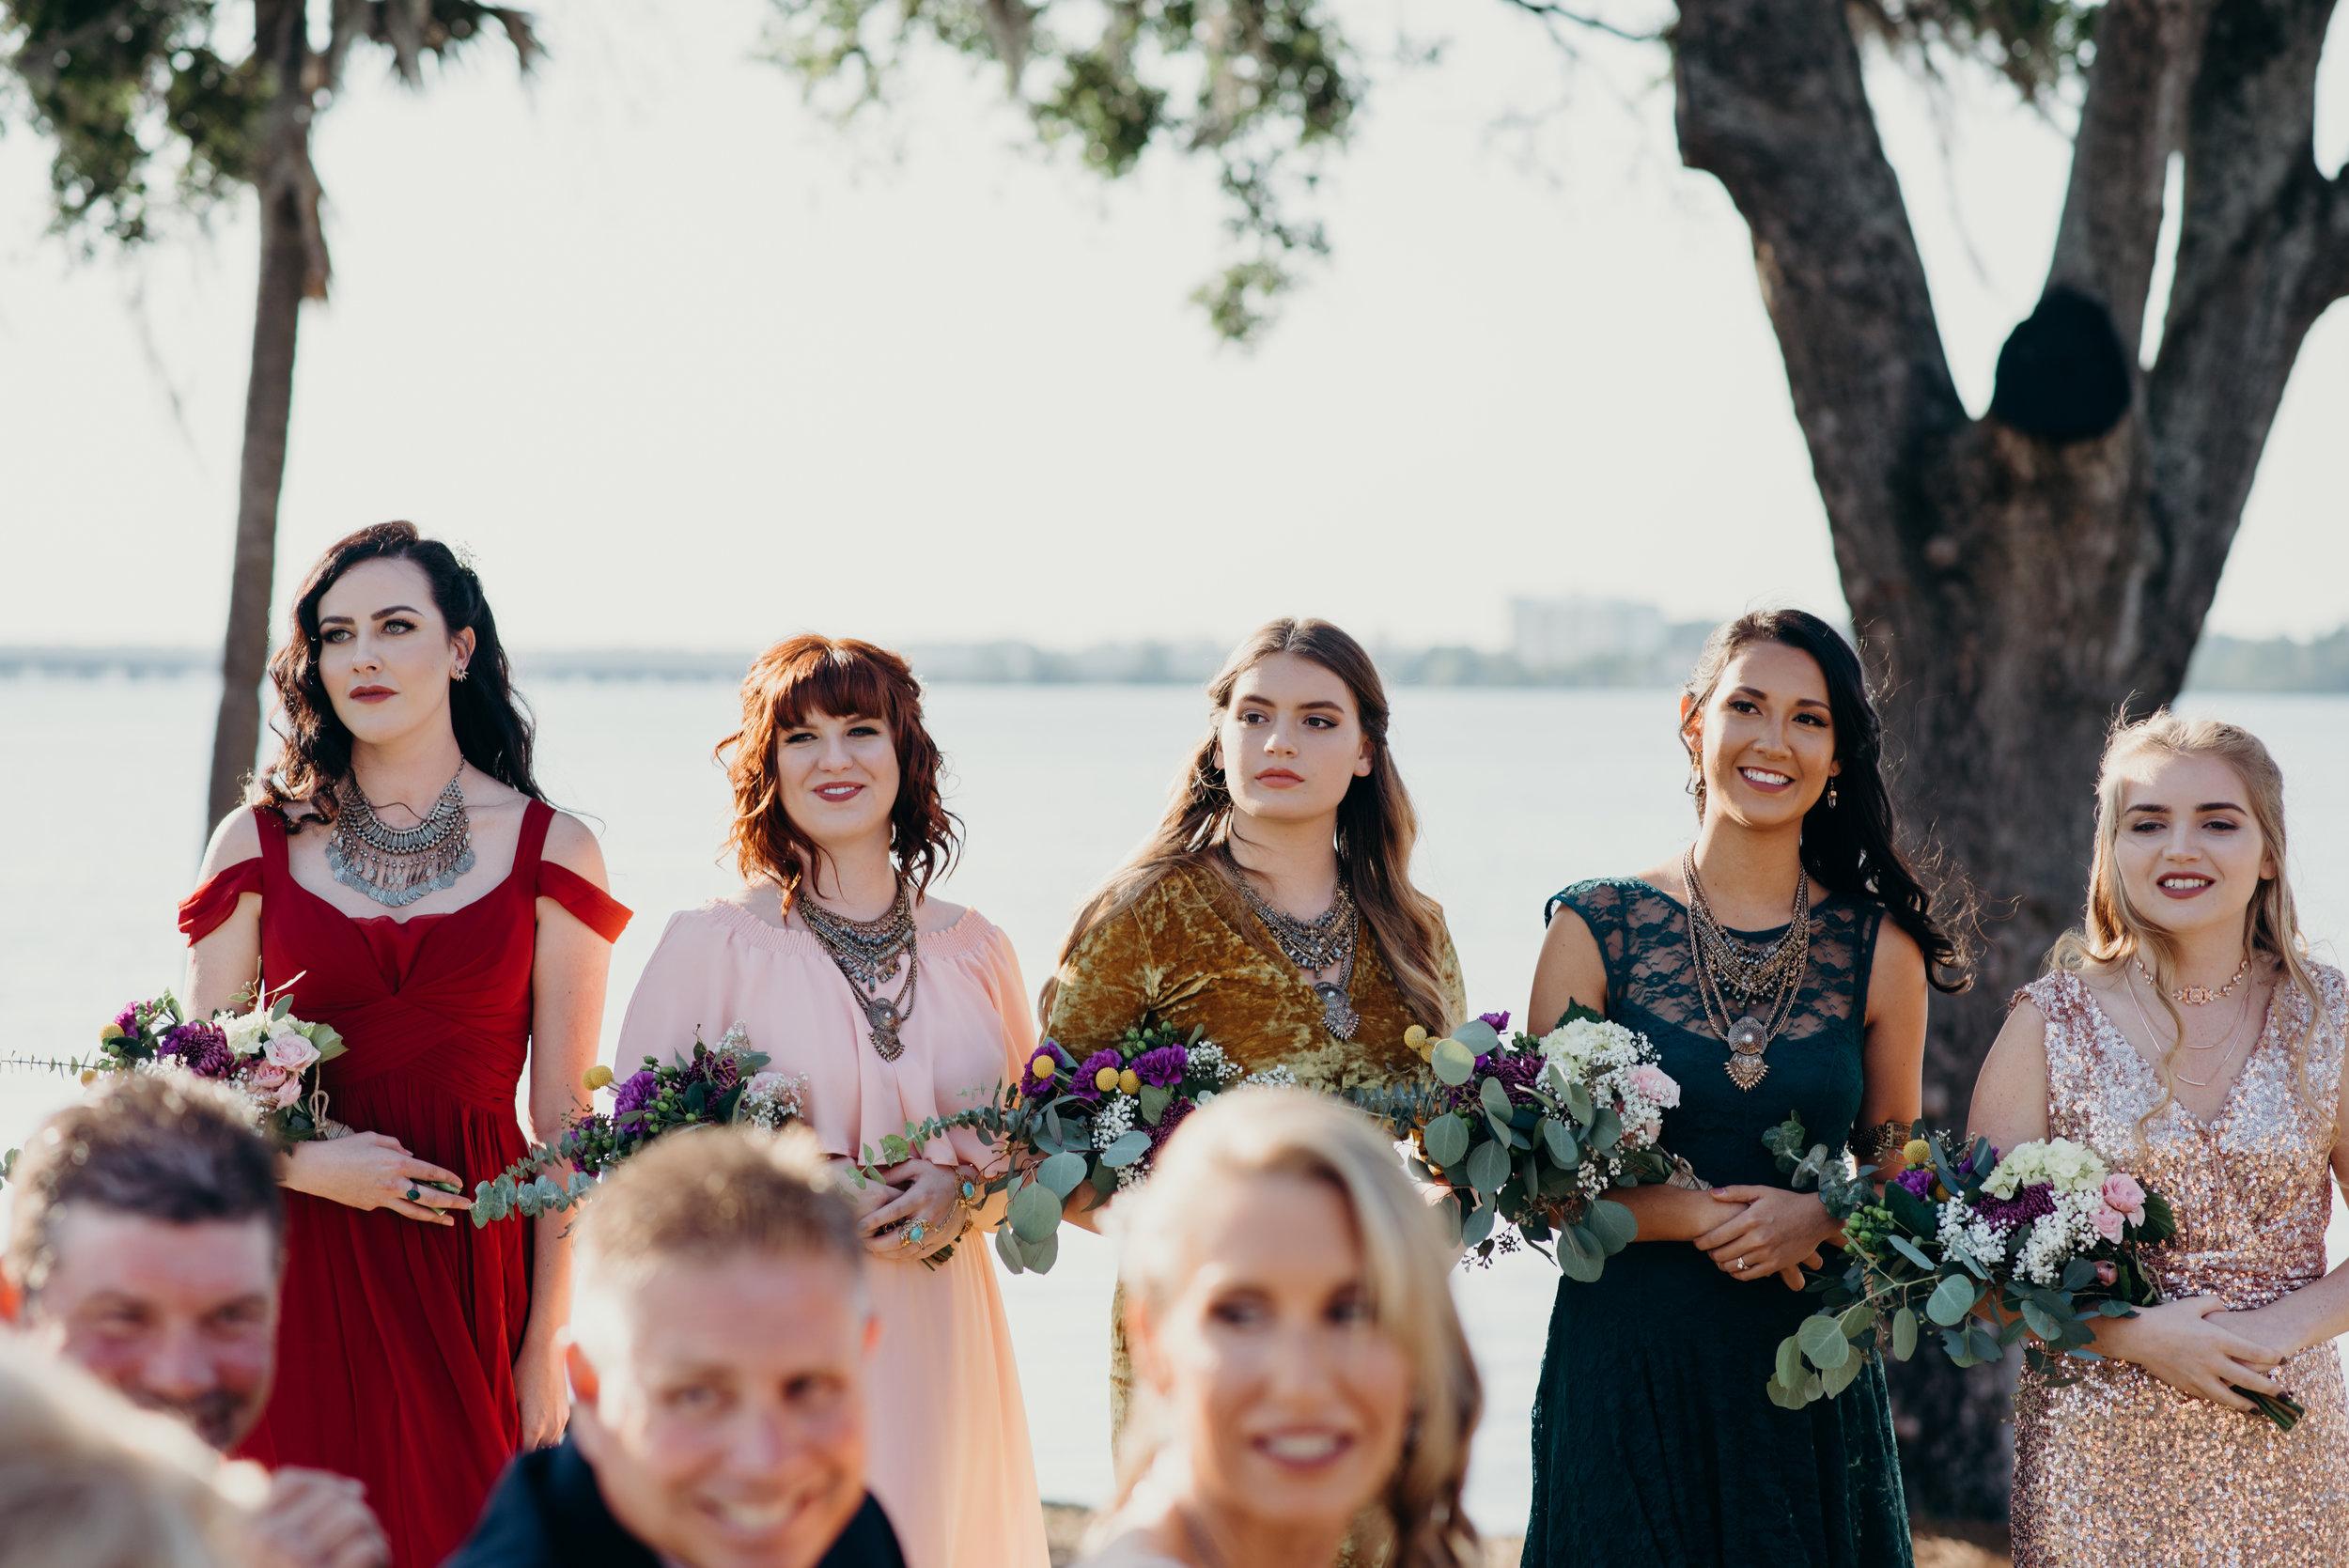 zayda-collin-panama-city-wedding-photography-trippy-bohemian-lisa-frank-wedding-ceremony-36.jpg